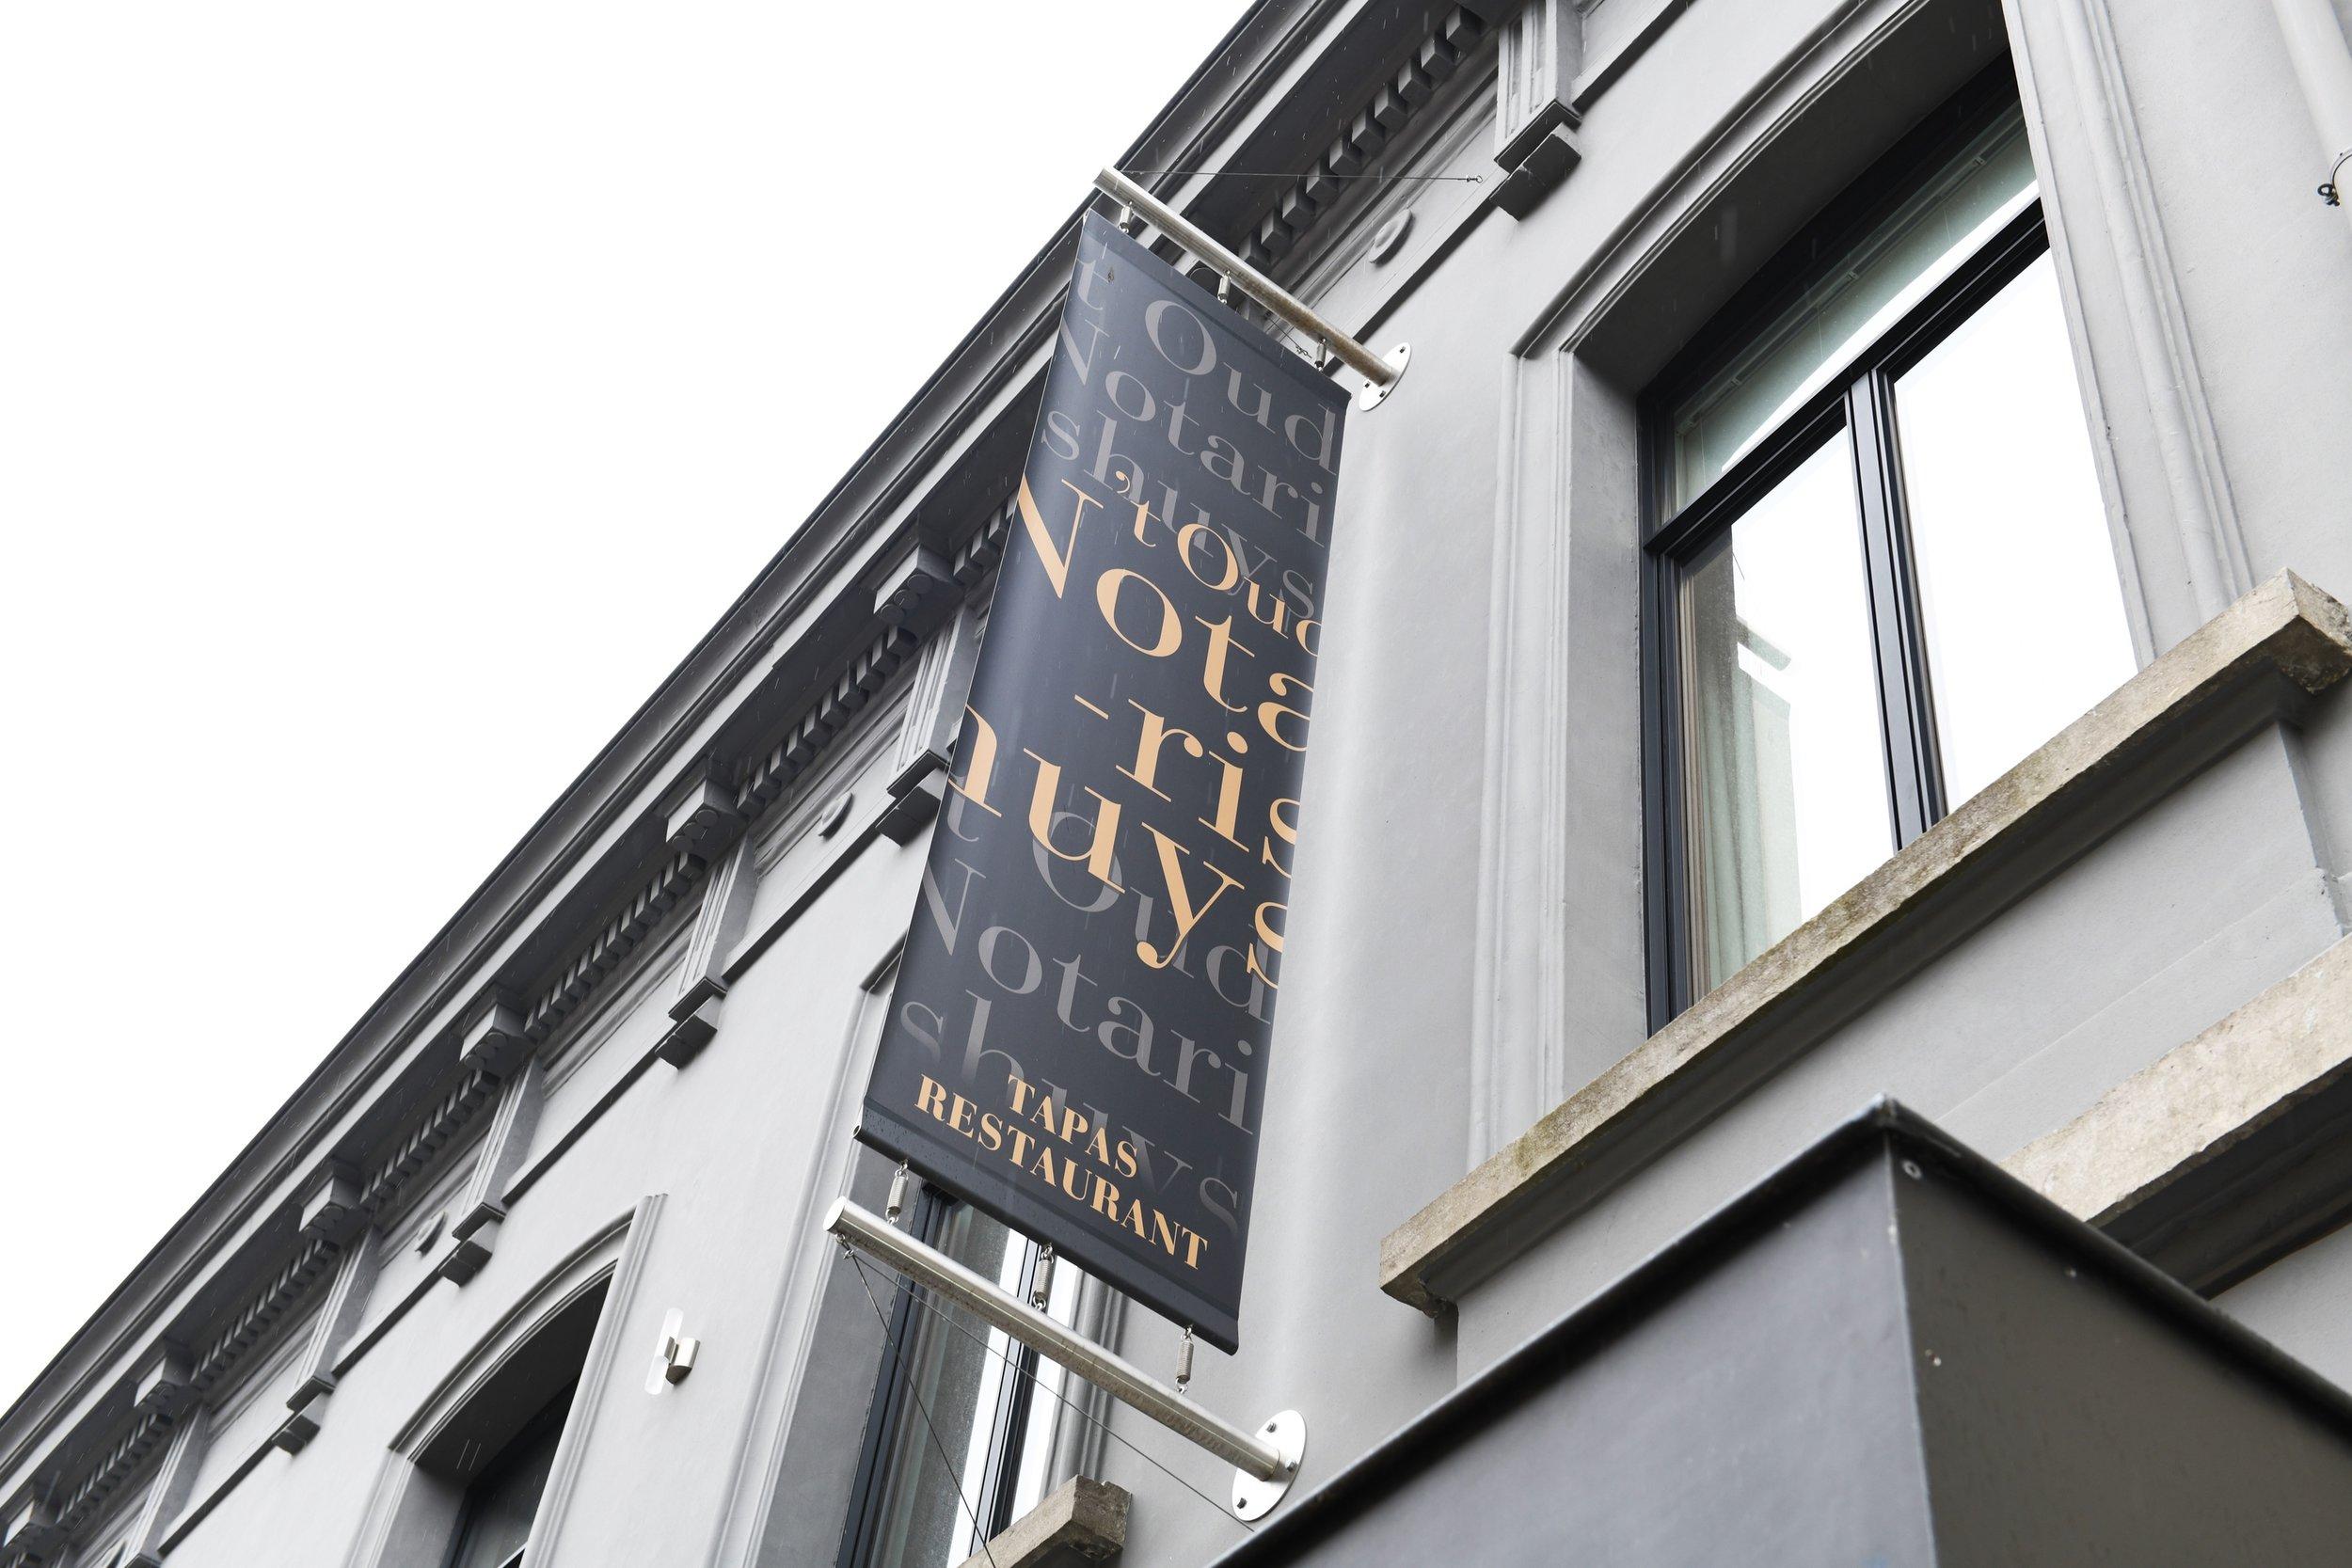 30 restaurant brasserie oud notarishuis ninove bart albrecht tablefever .jpg